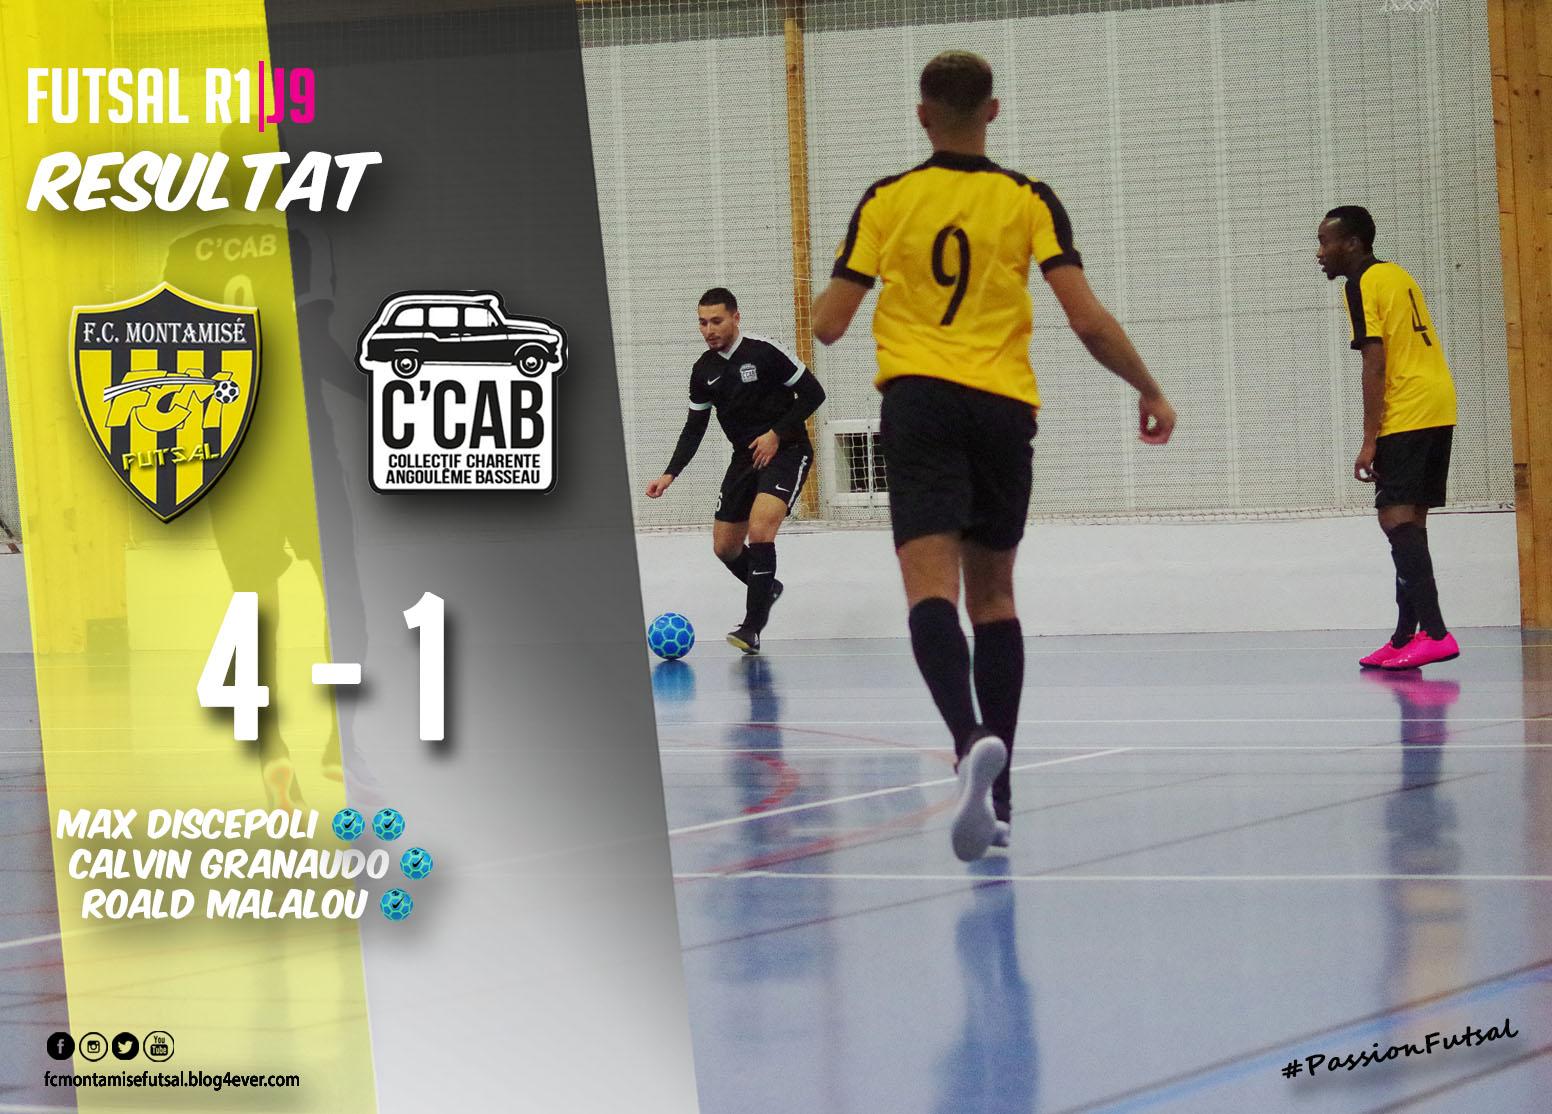 Résultat J9 FC Montamisé Futsal - C'CAB.jpg